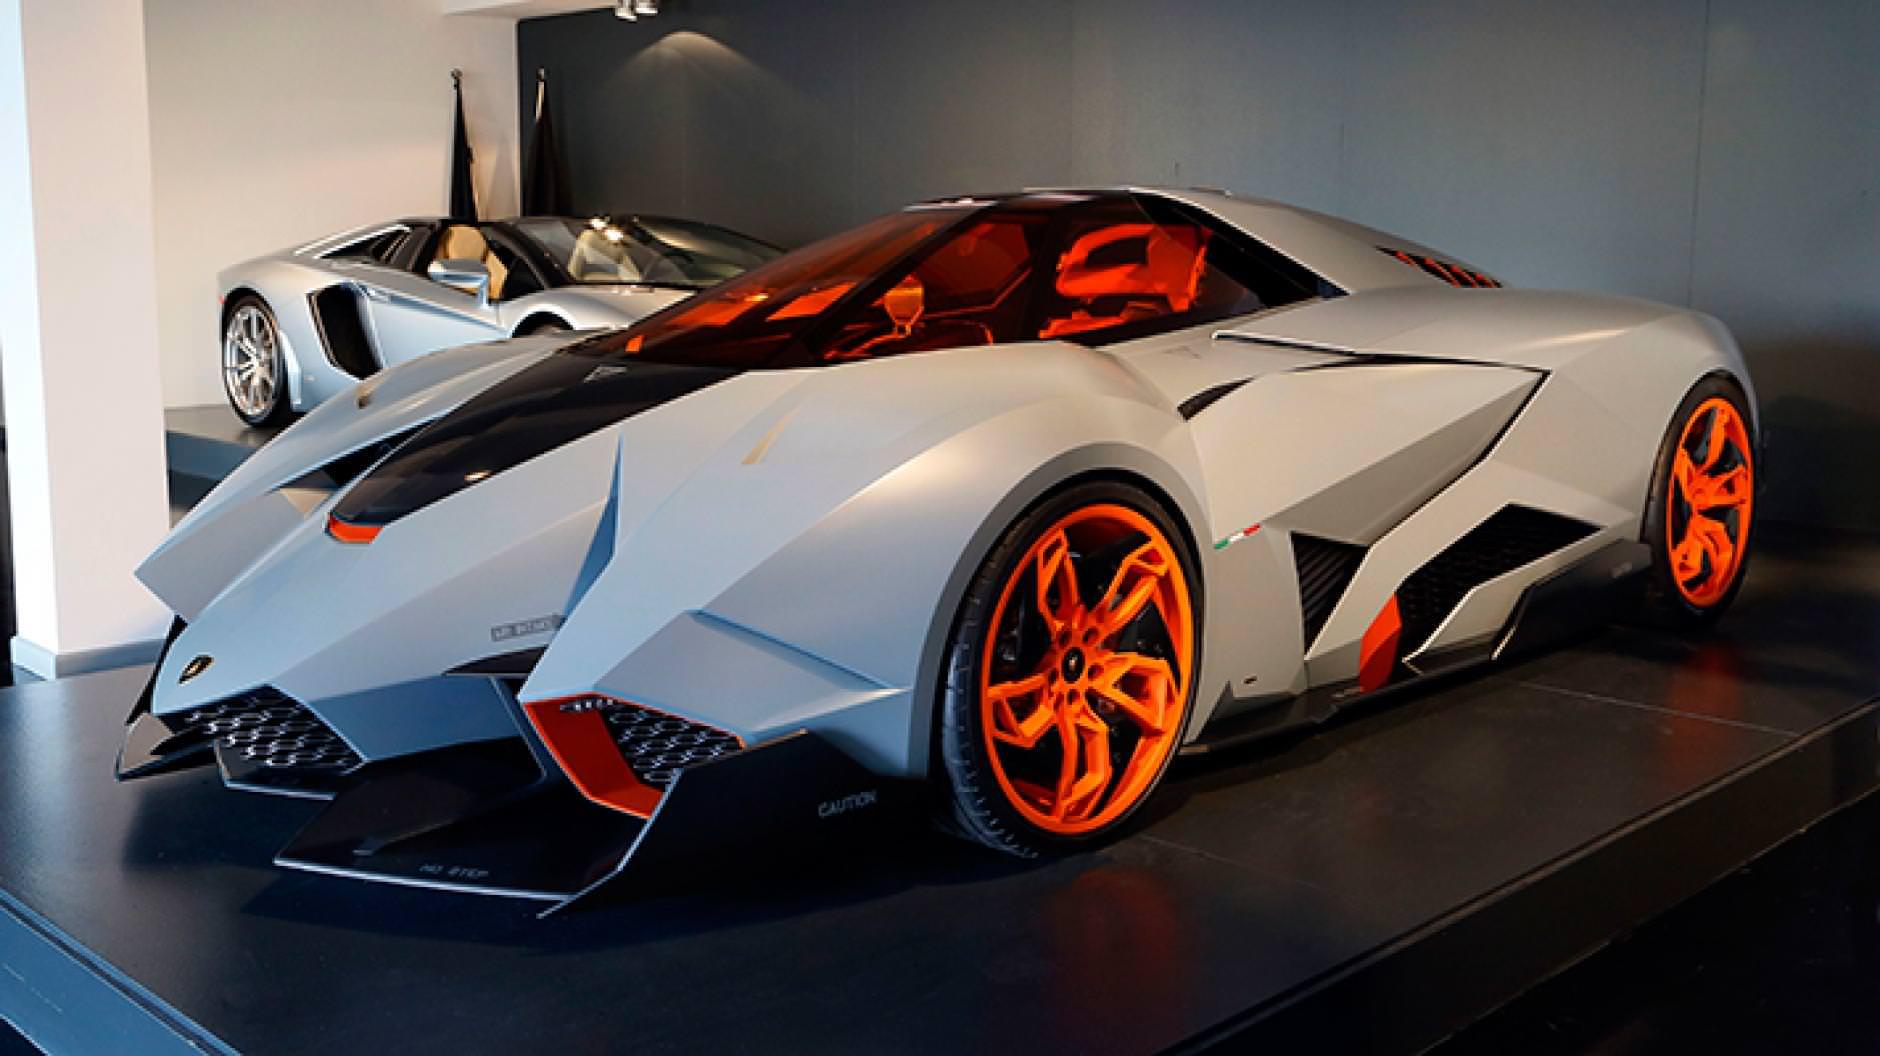 صورة اريد صور سيارات , شاهد صور سيارات